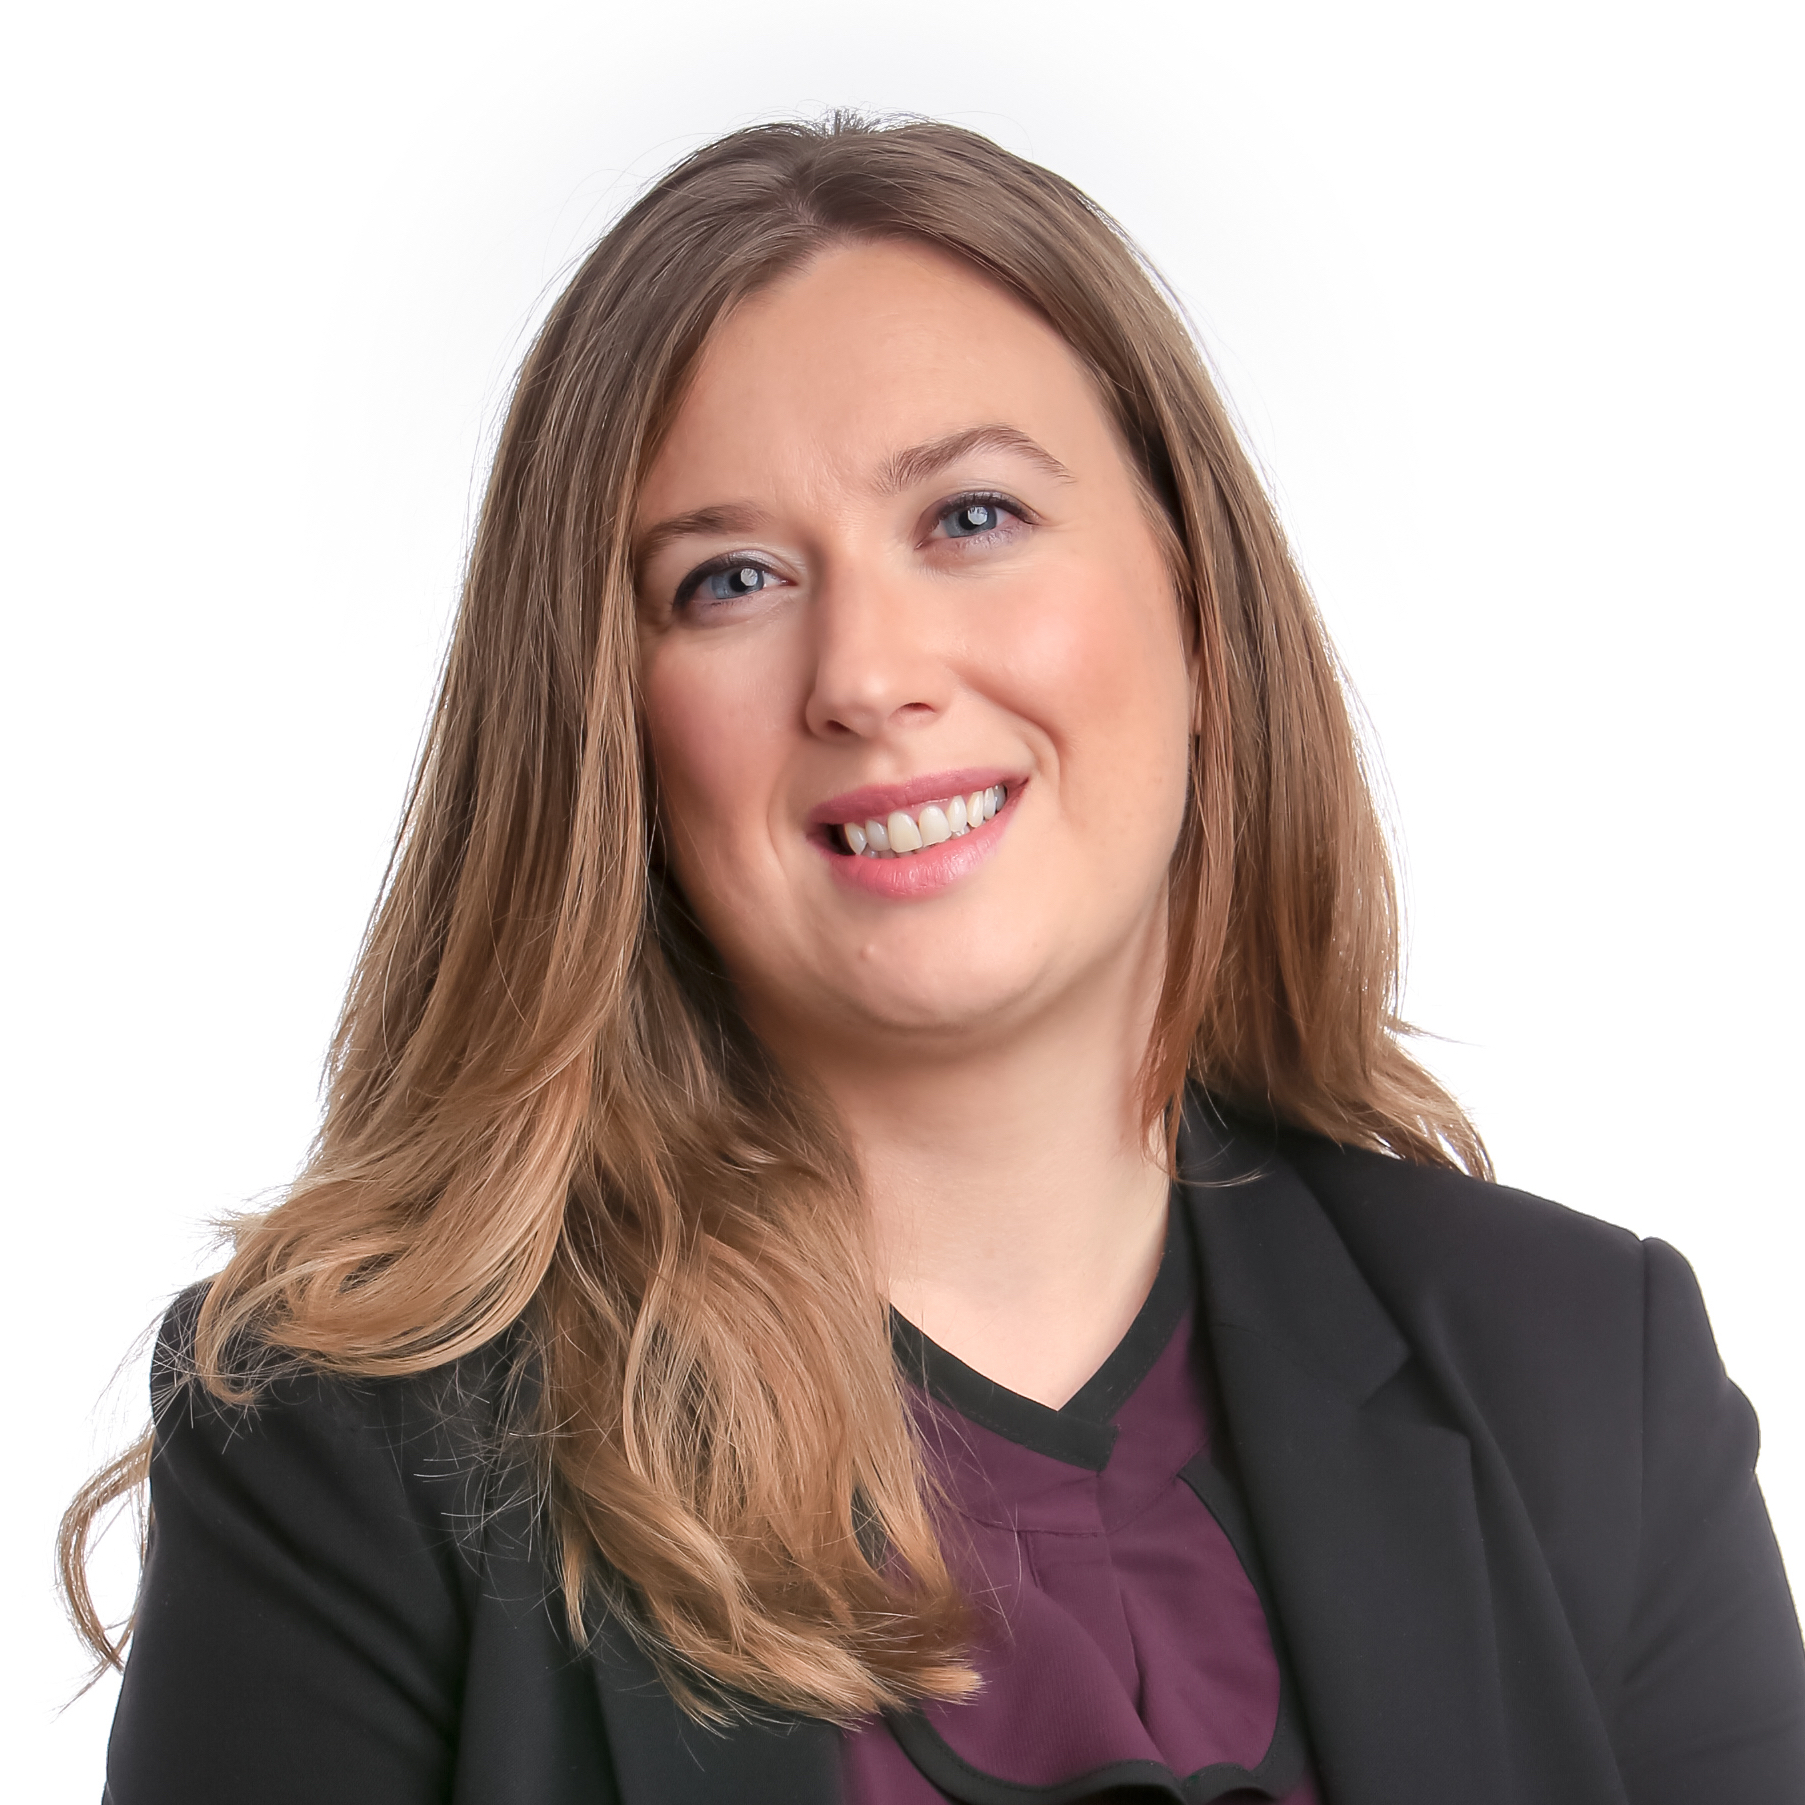 Elaine Lard  Vice President of Global Supply Chain, Logitech